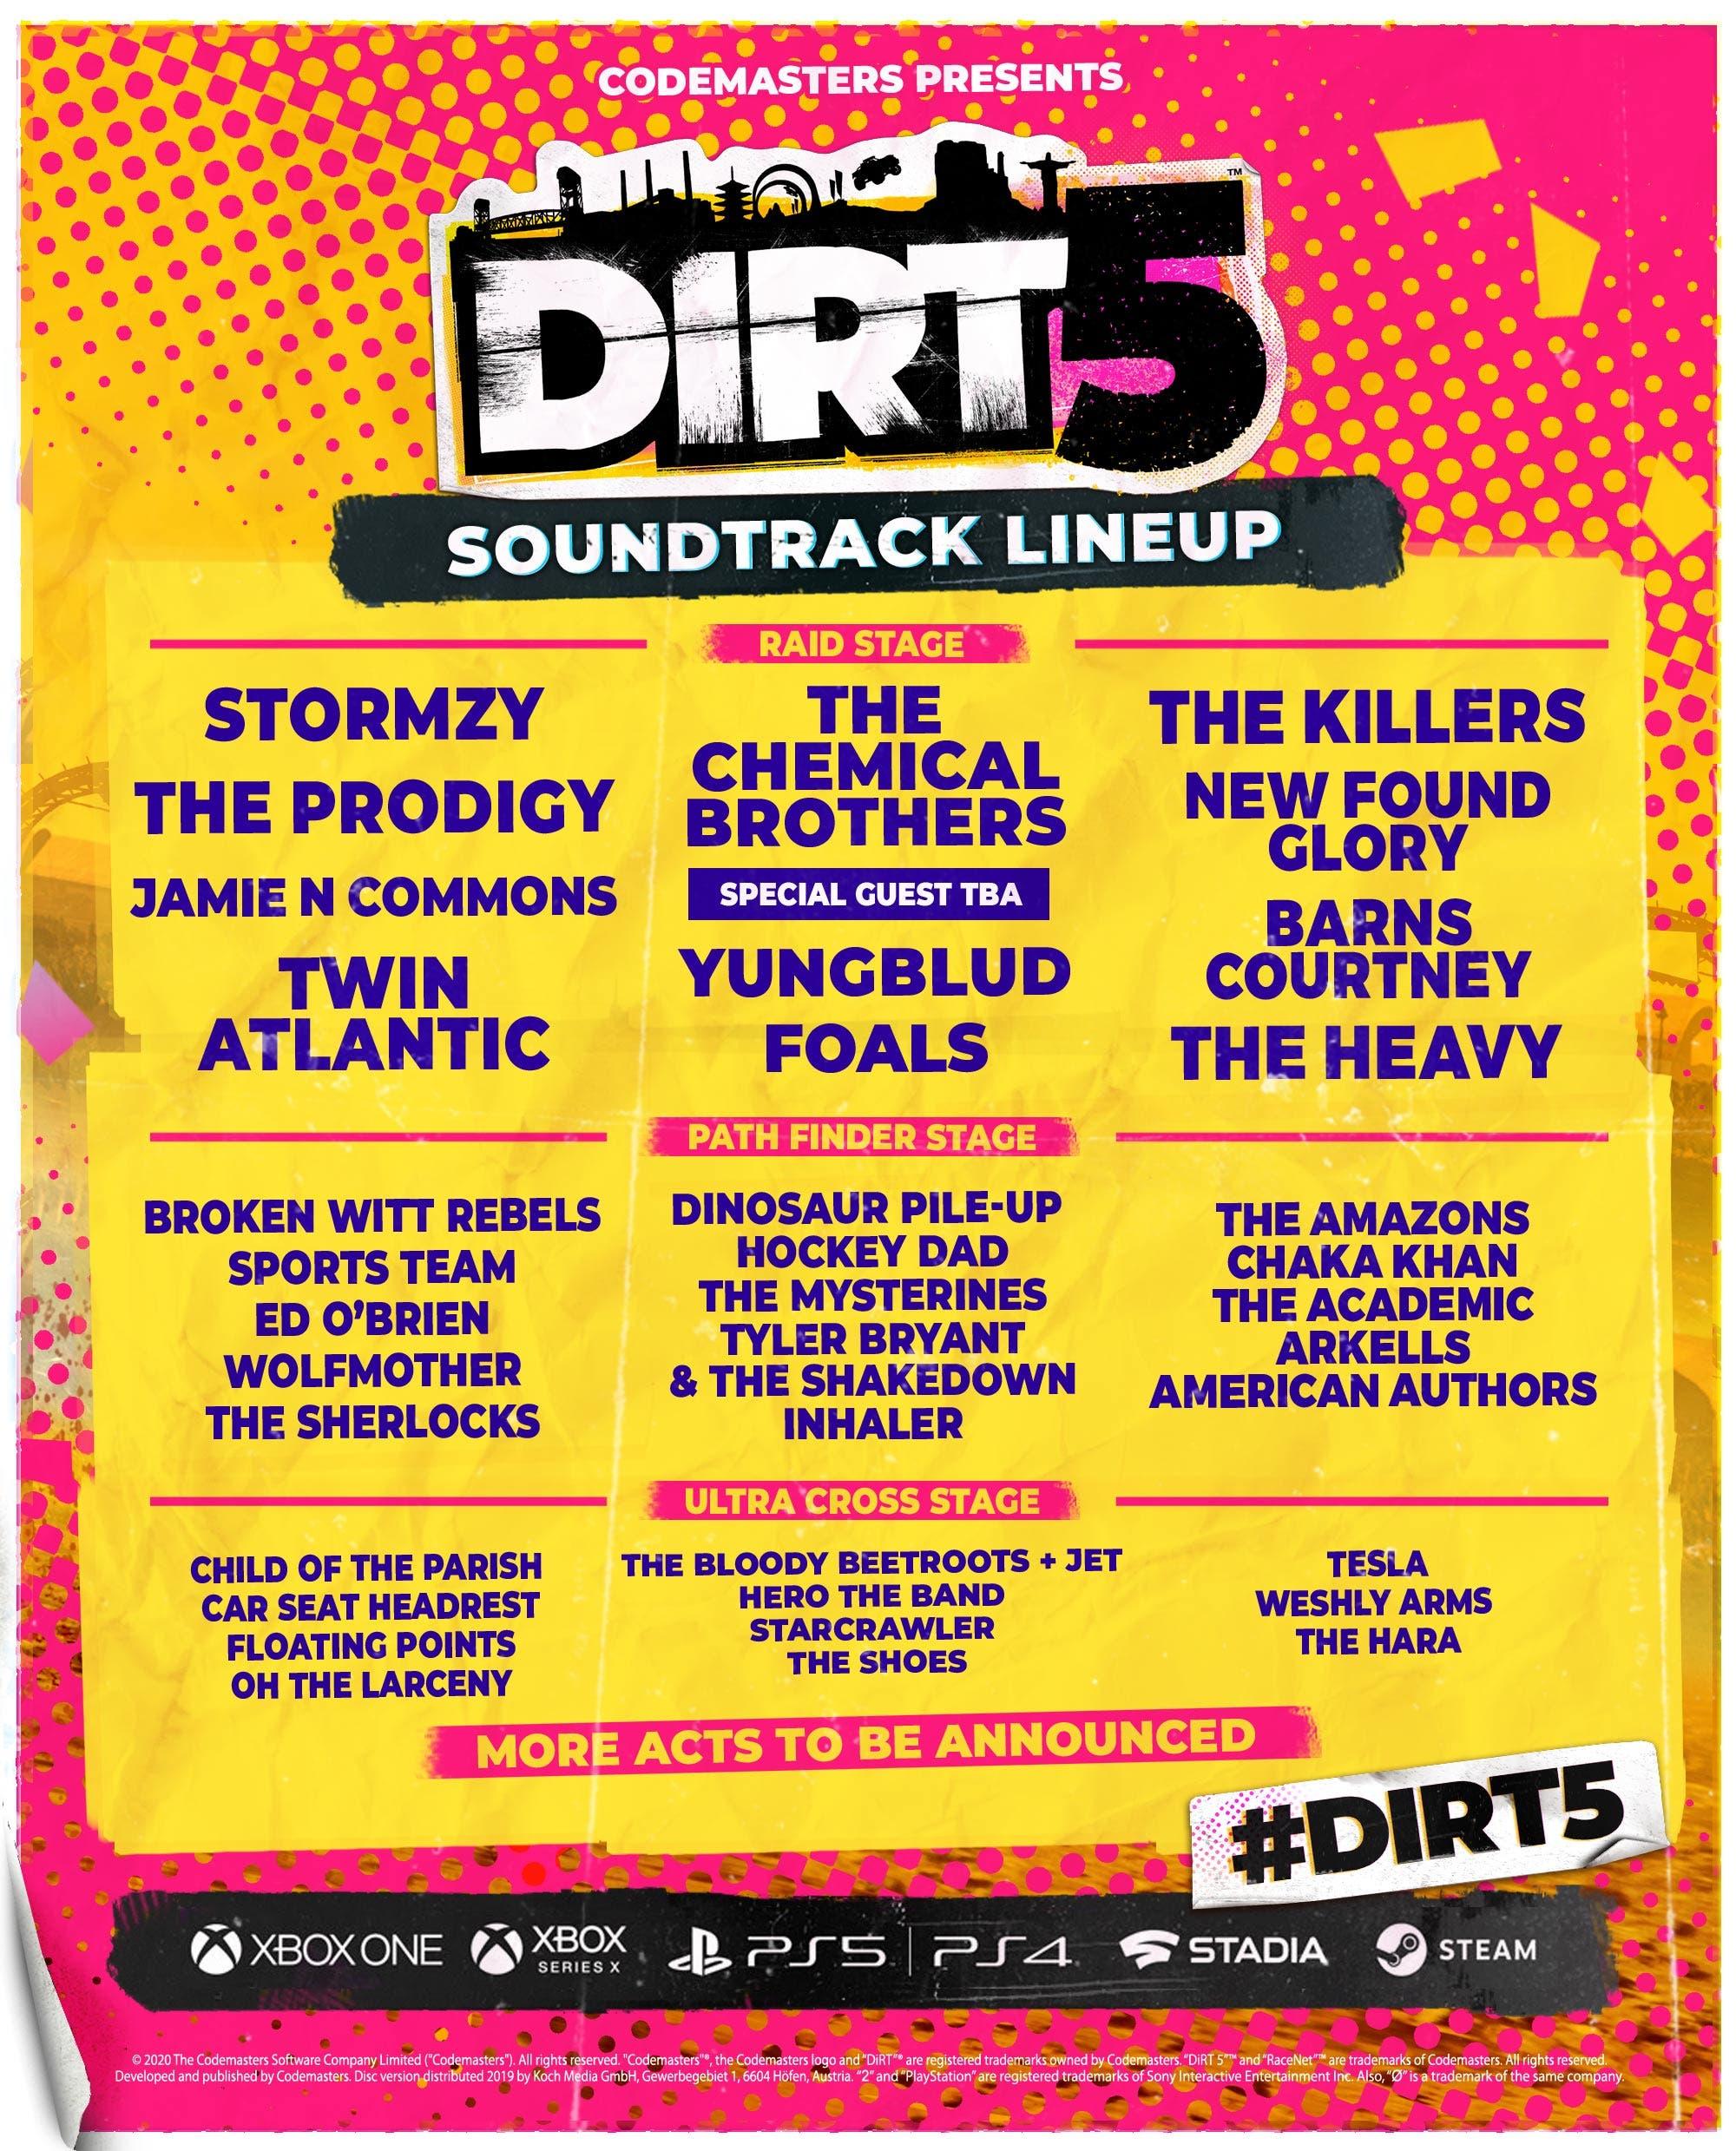 DIRT5 Soundtrack promo